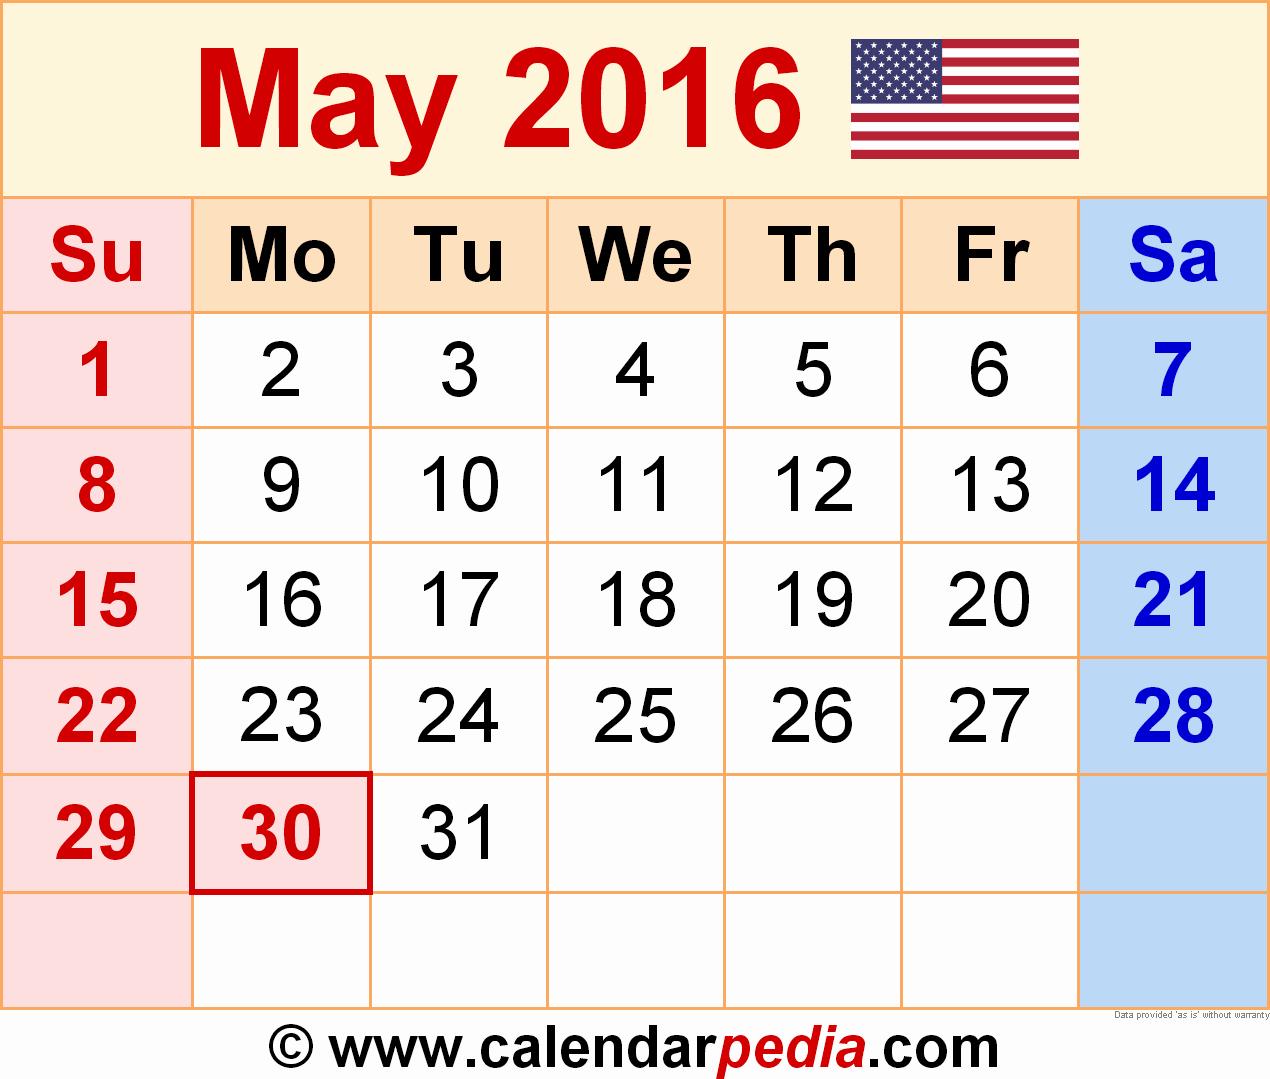 Calendar 2016 Printable with Holidays Inspirational January 2016 Calendar Holidays – 2017 Printable Calendar